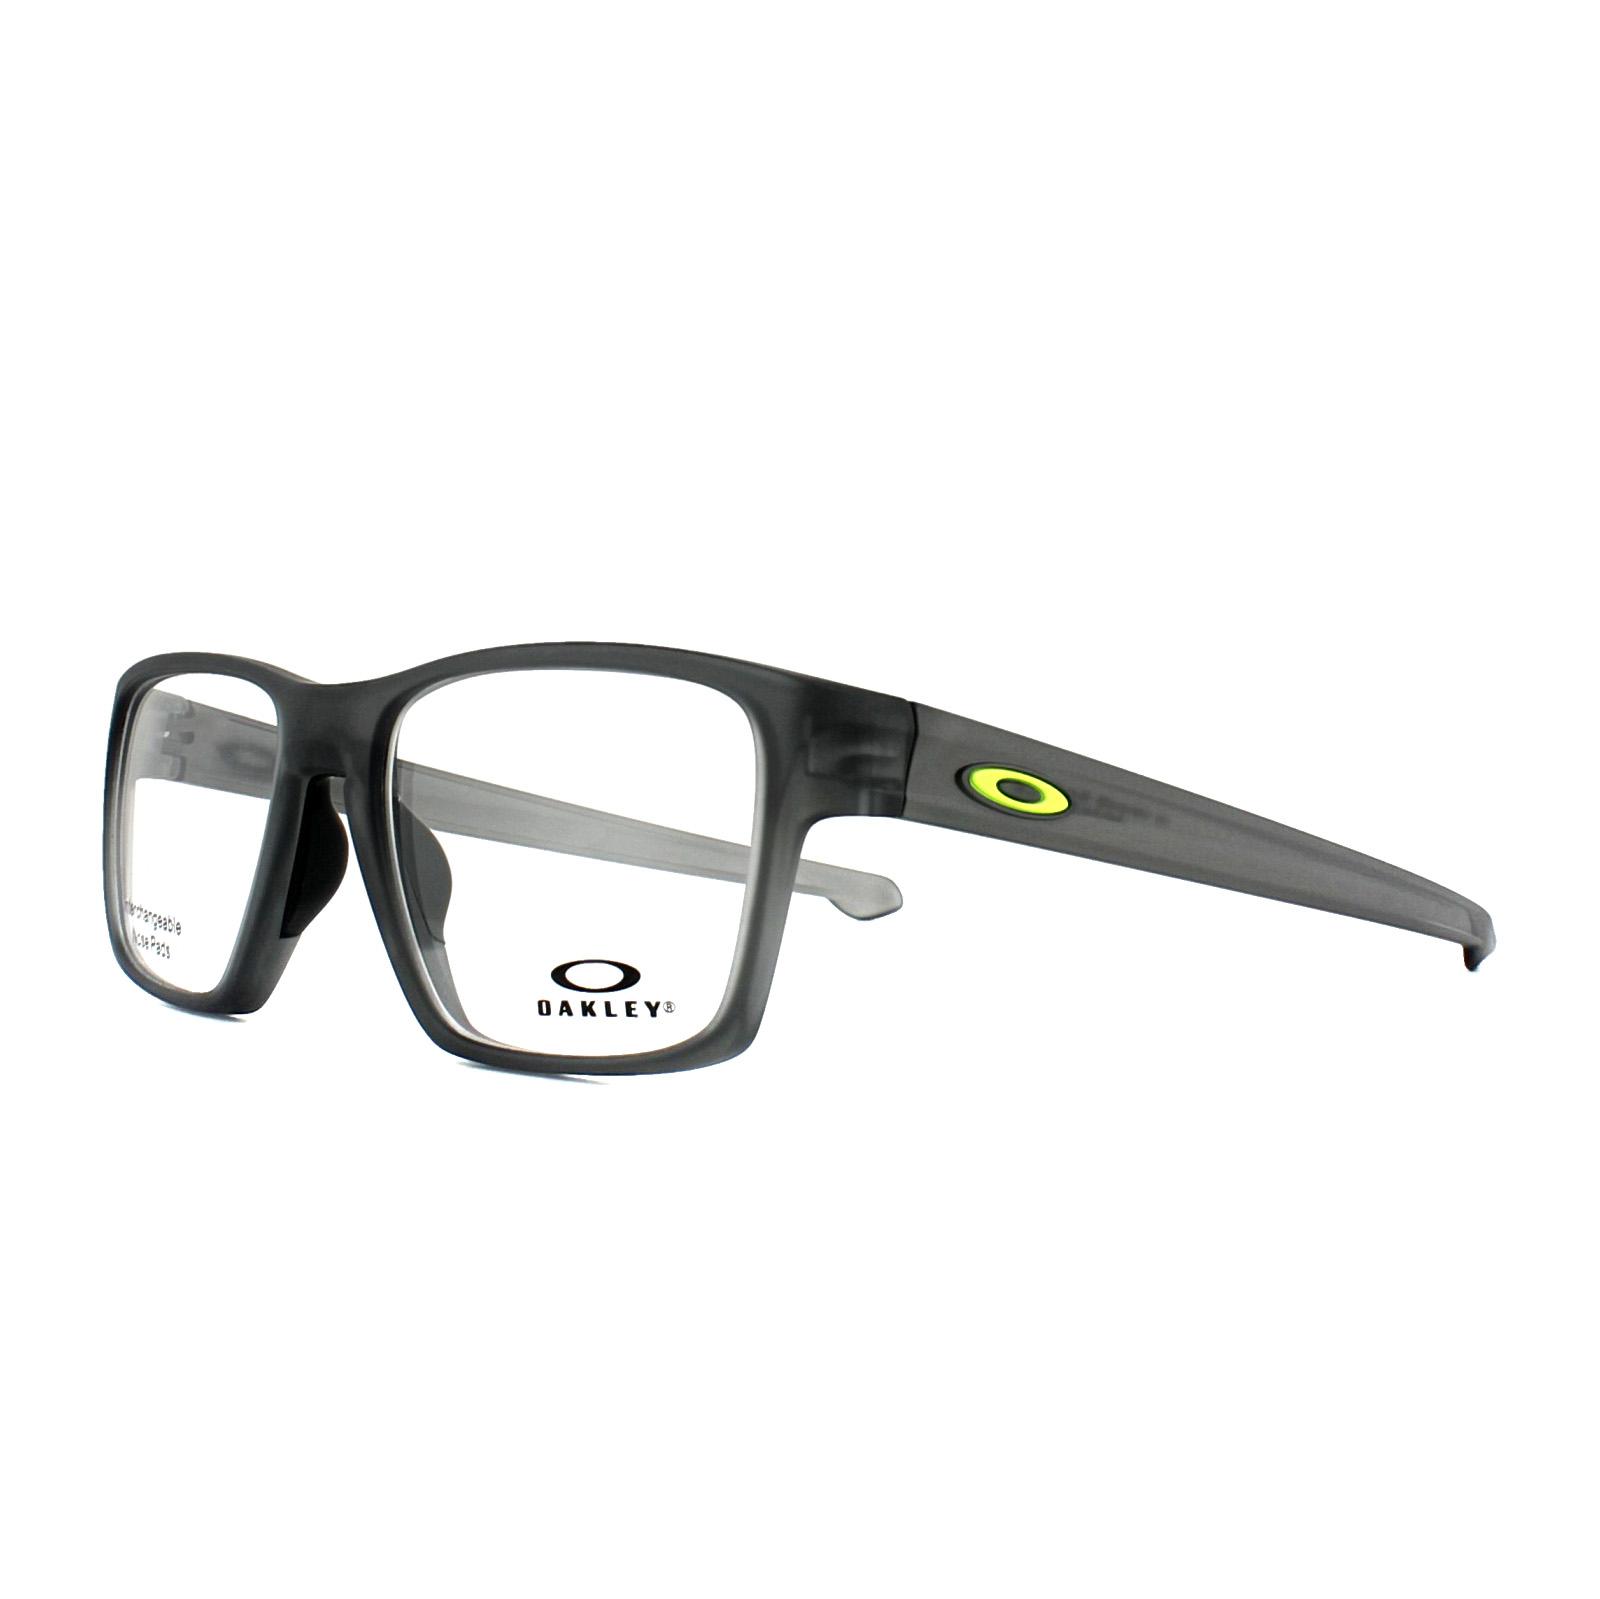 2e76b894f25 Sentinel Oakley Glasses Frames Litebeam OX8140-02 Satin Grey Smoke 55mm Mens